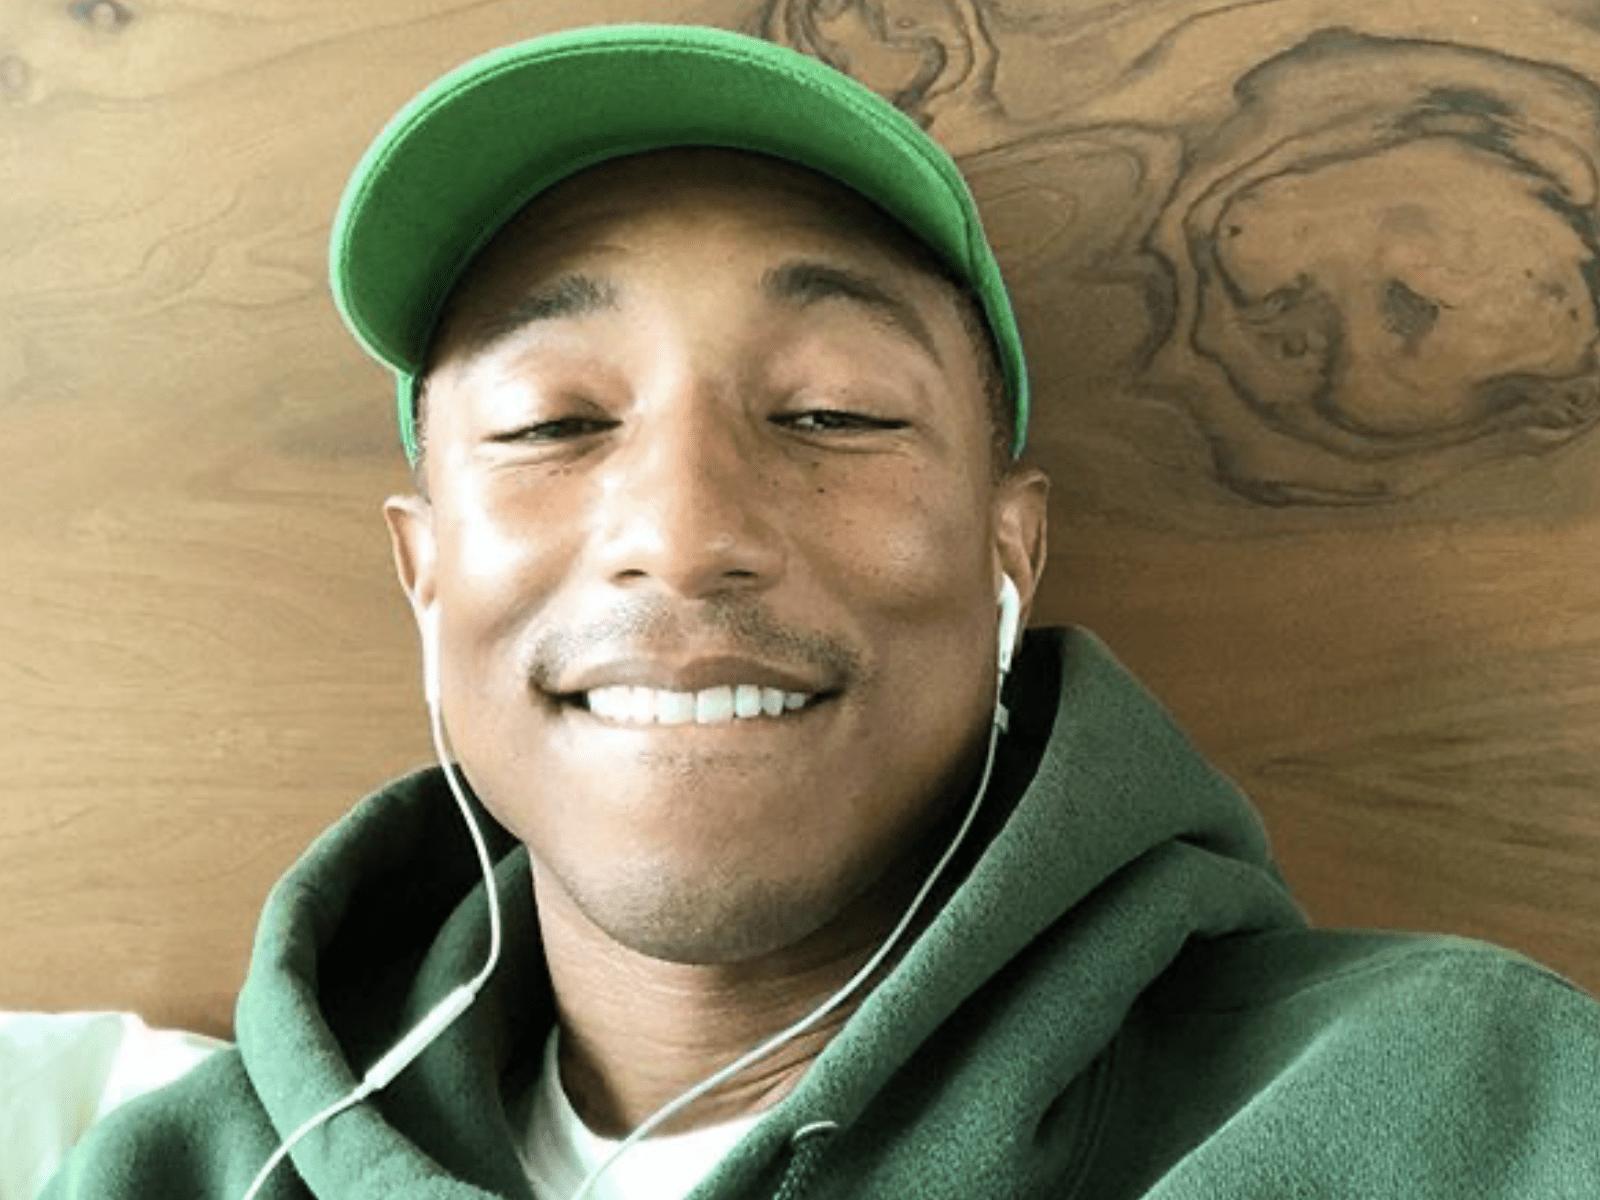 Pharrell Williams Selfie Pic 15